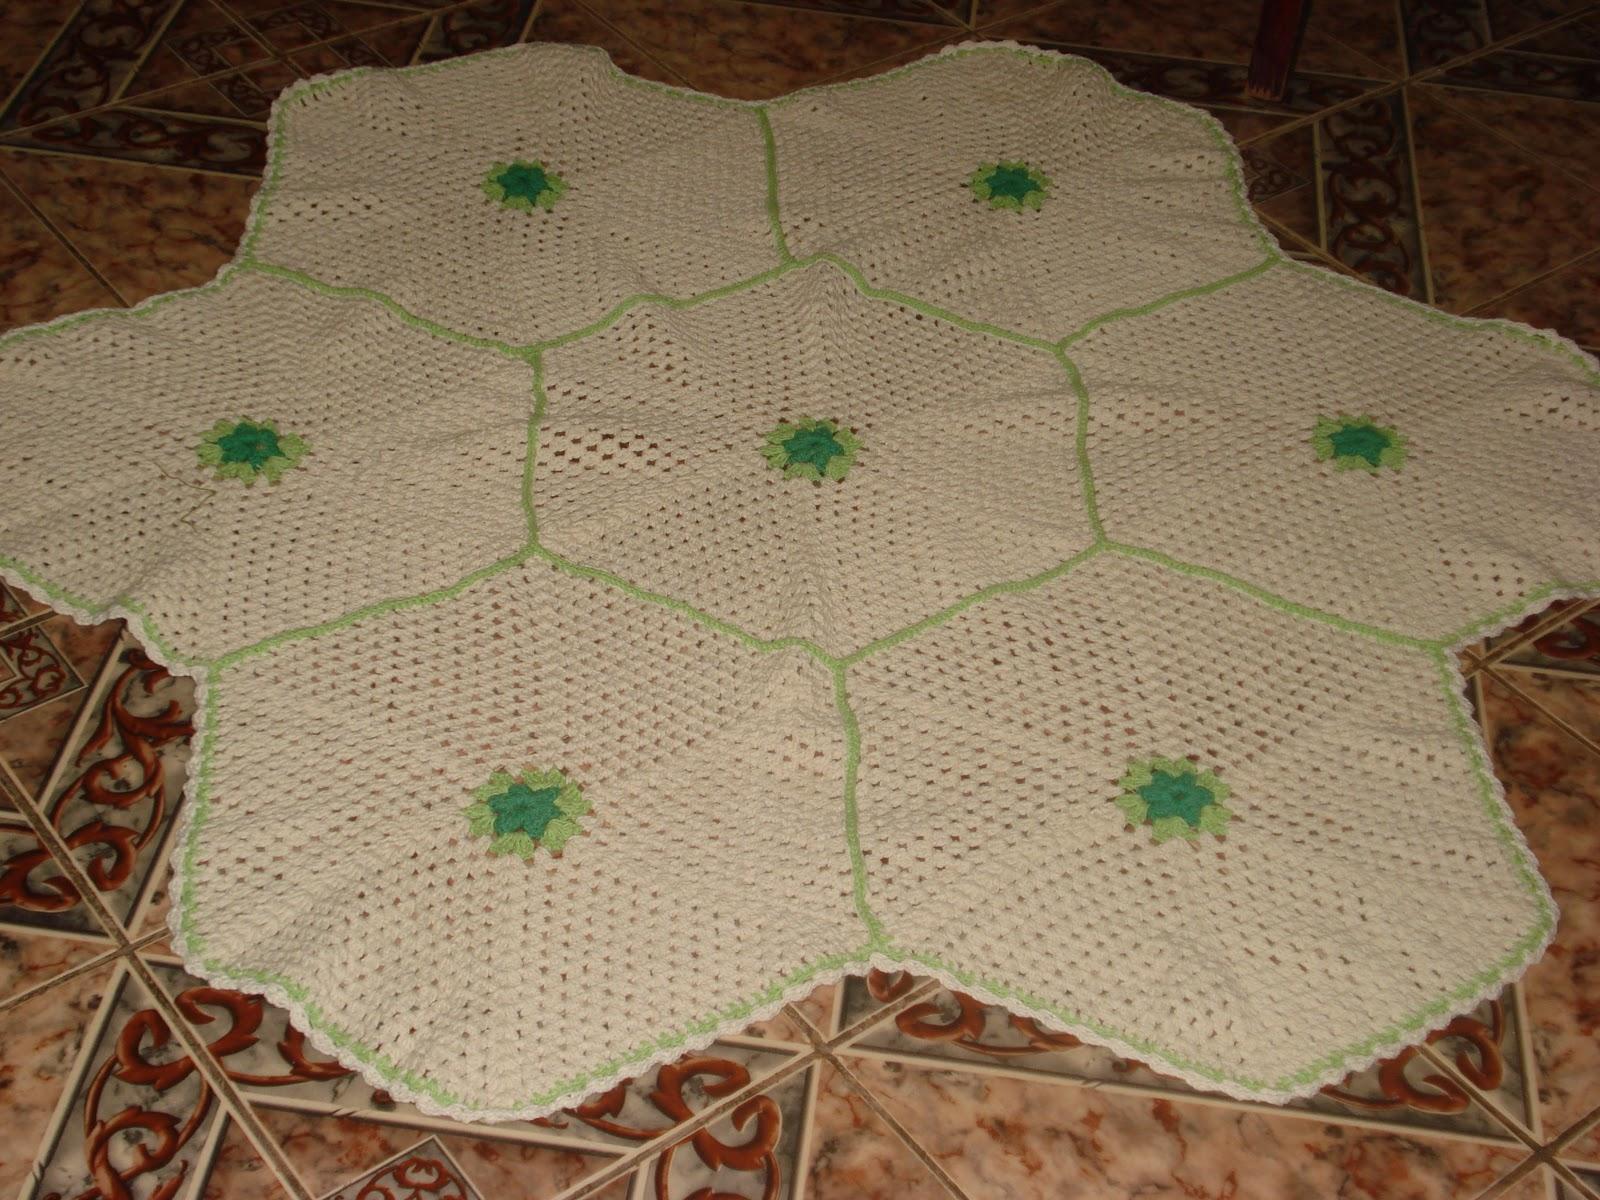 Betina At Lier Tapetes De Croch Em Cord O -> Tapete Croche Grande